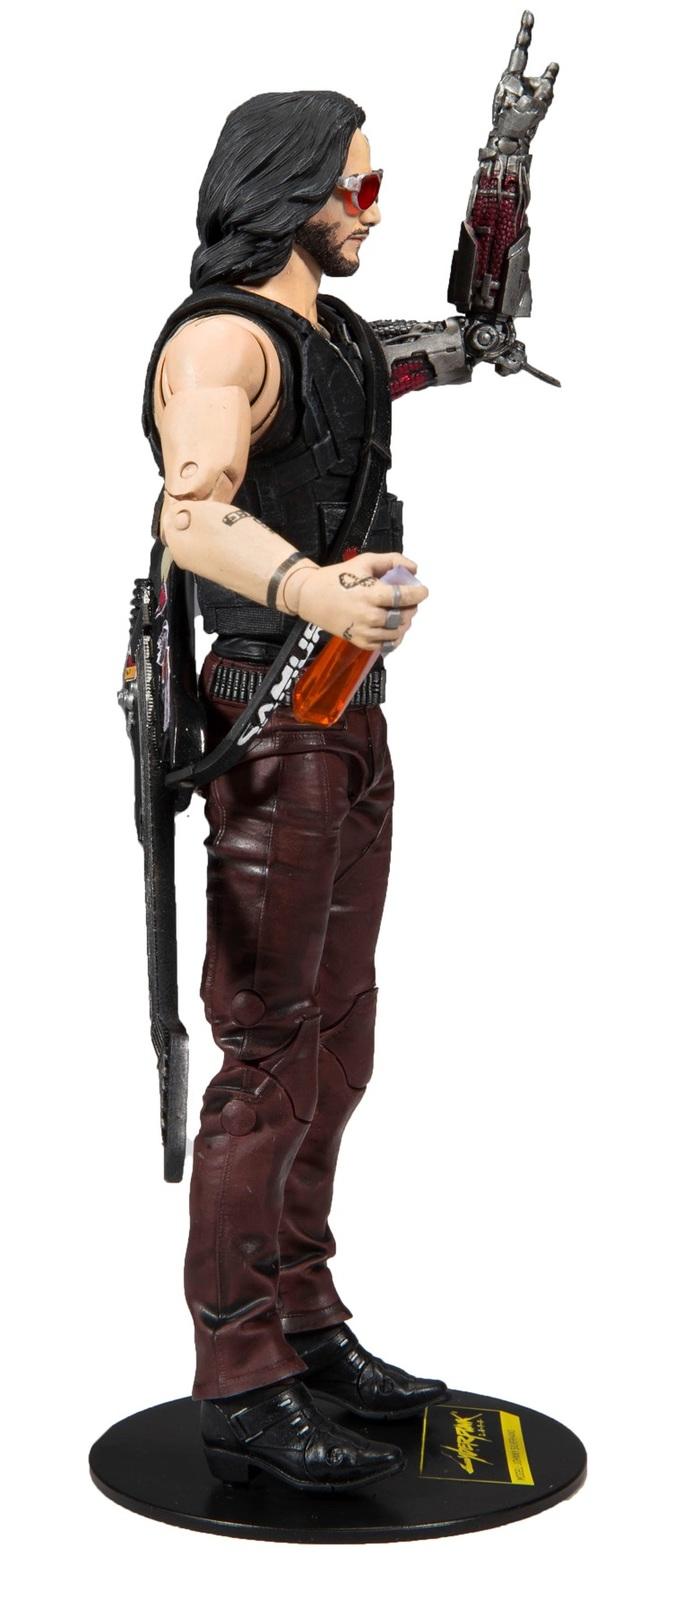 "Cyberpunk 2077: Johnny Silverhand - 7"" Articulated Figure image"